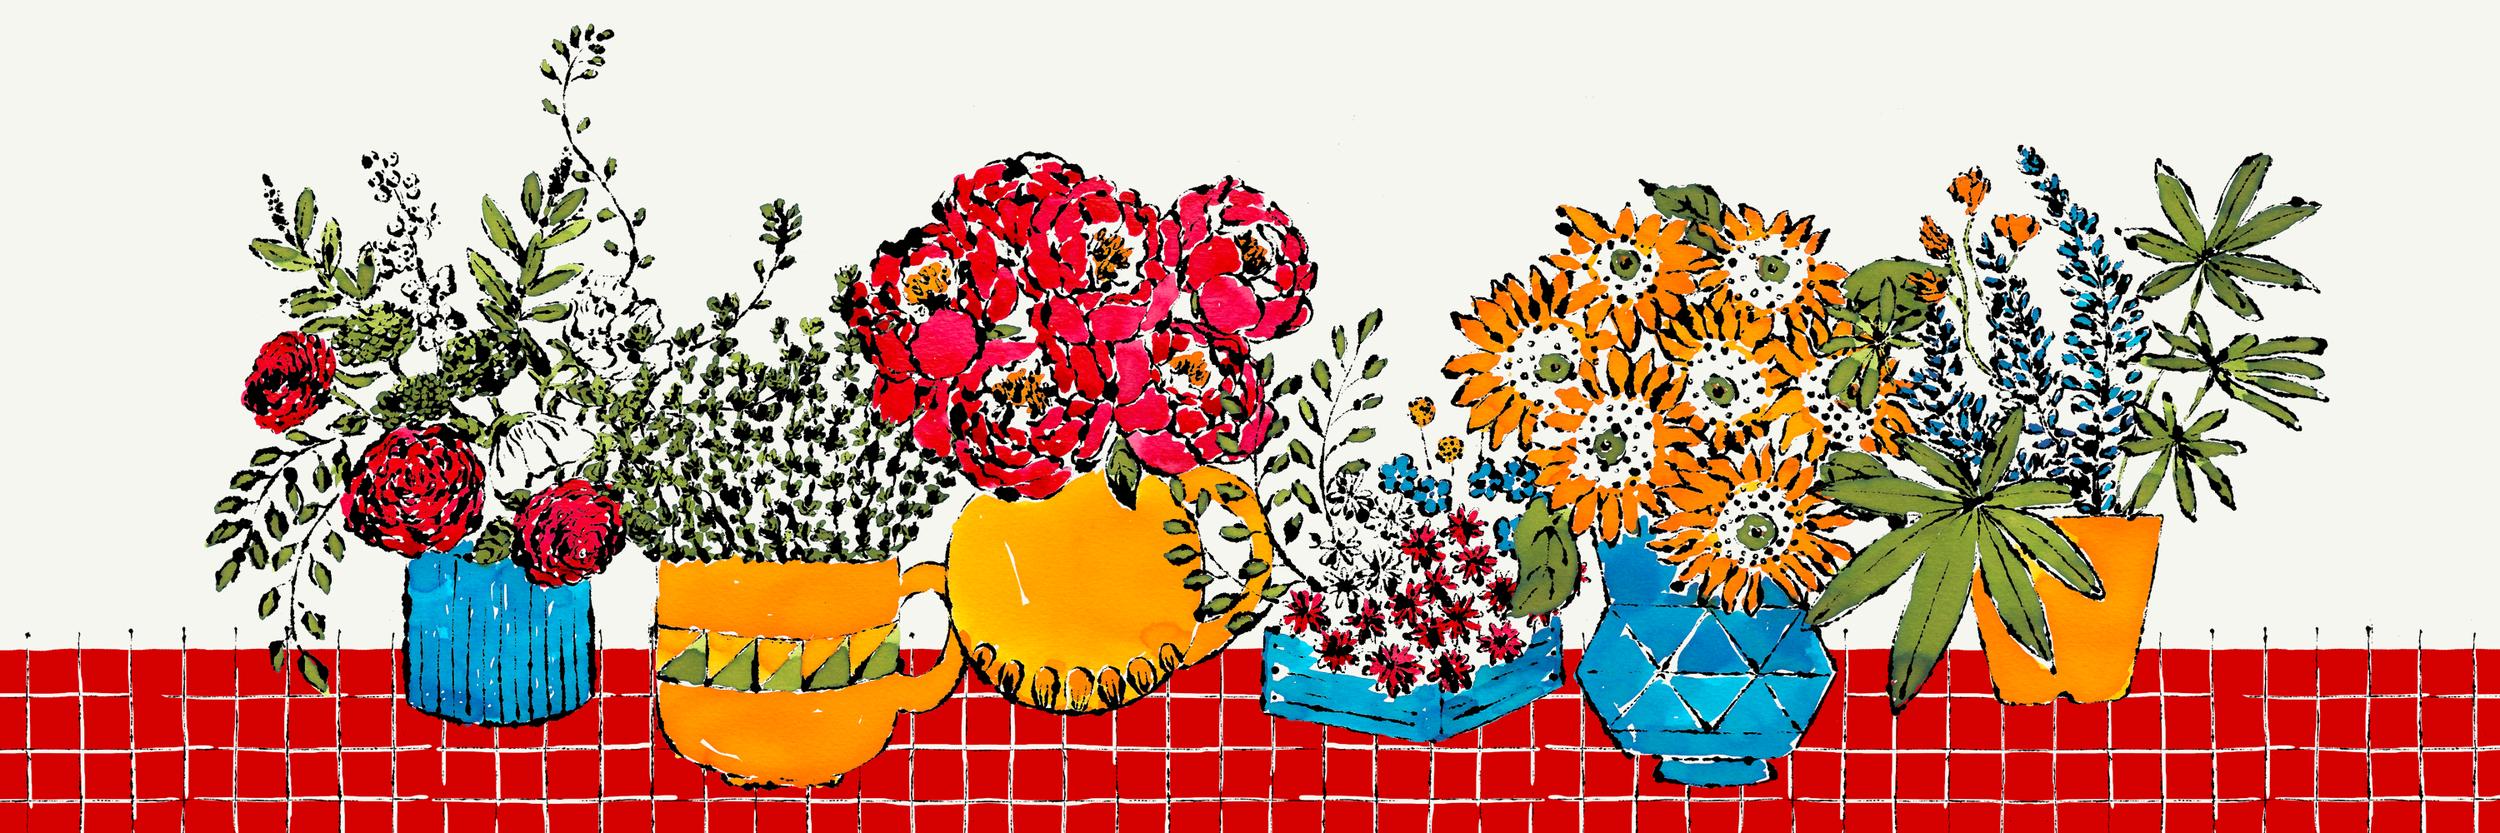 GreenmarrowStudio_FlowerVases